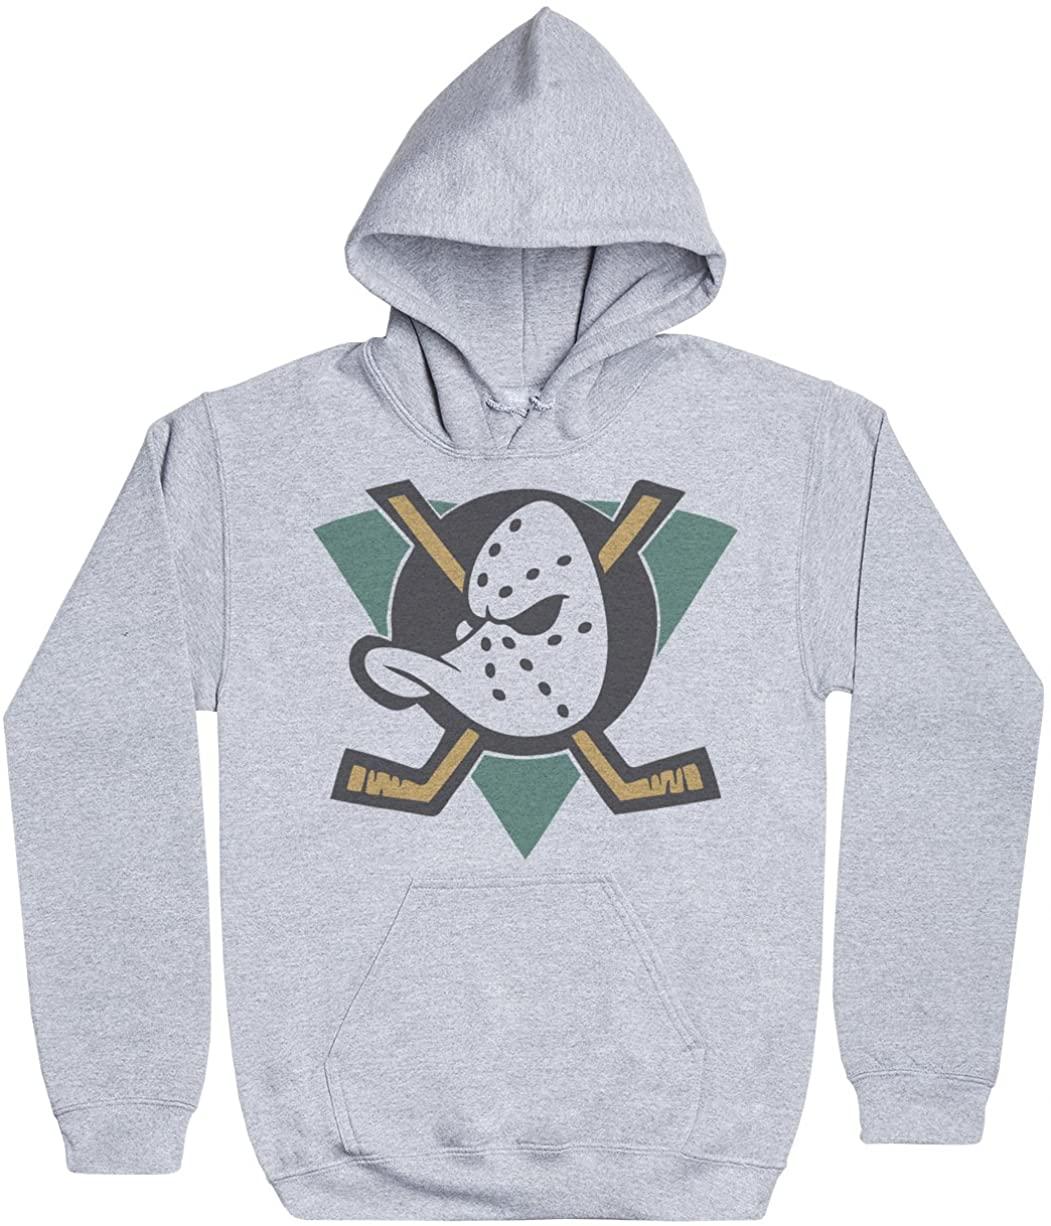 Mighty Ducks Men's Novelty Hoodie, Mens Gift, Gift for Him, Mens Top